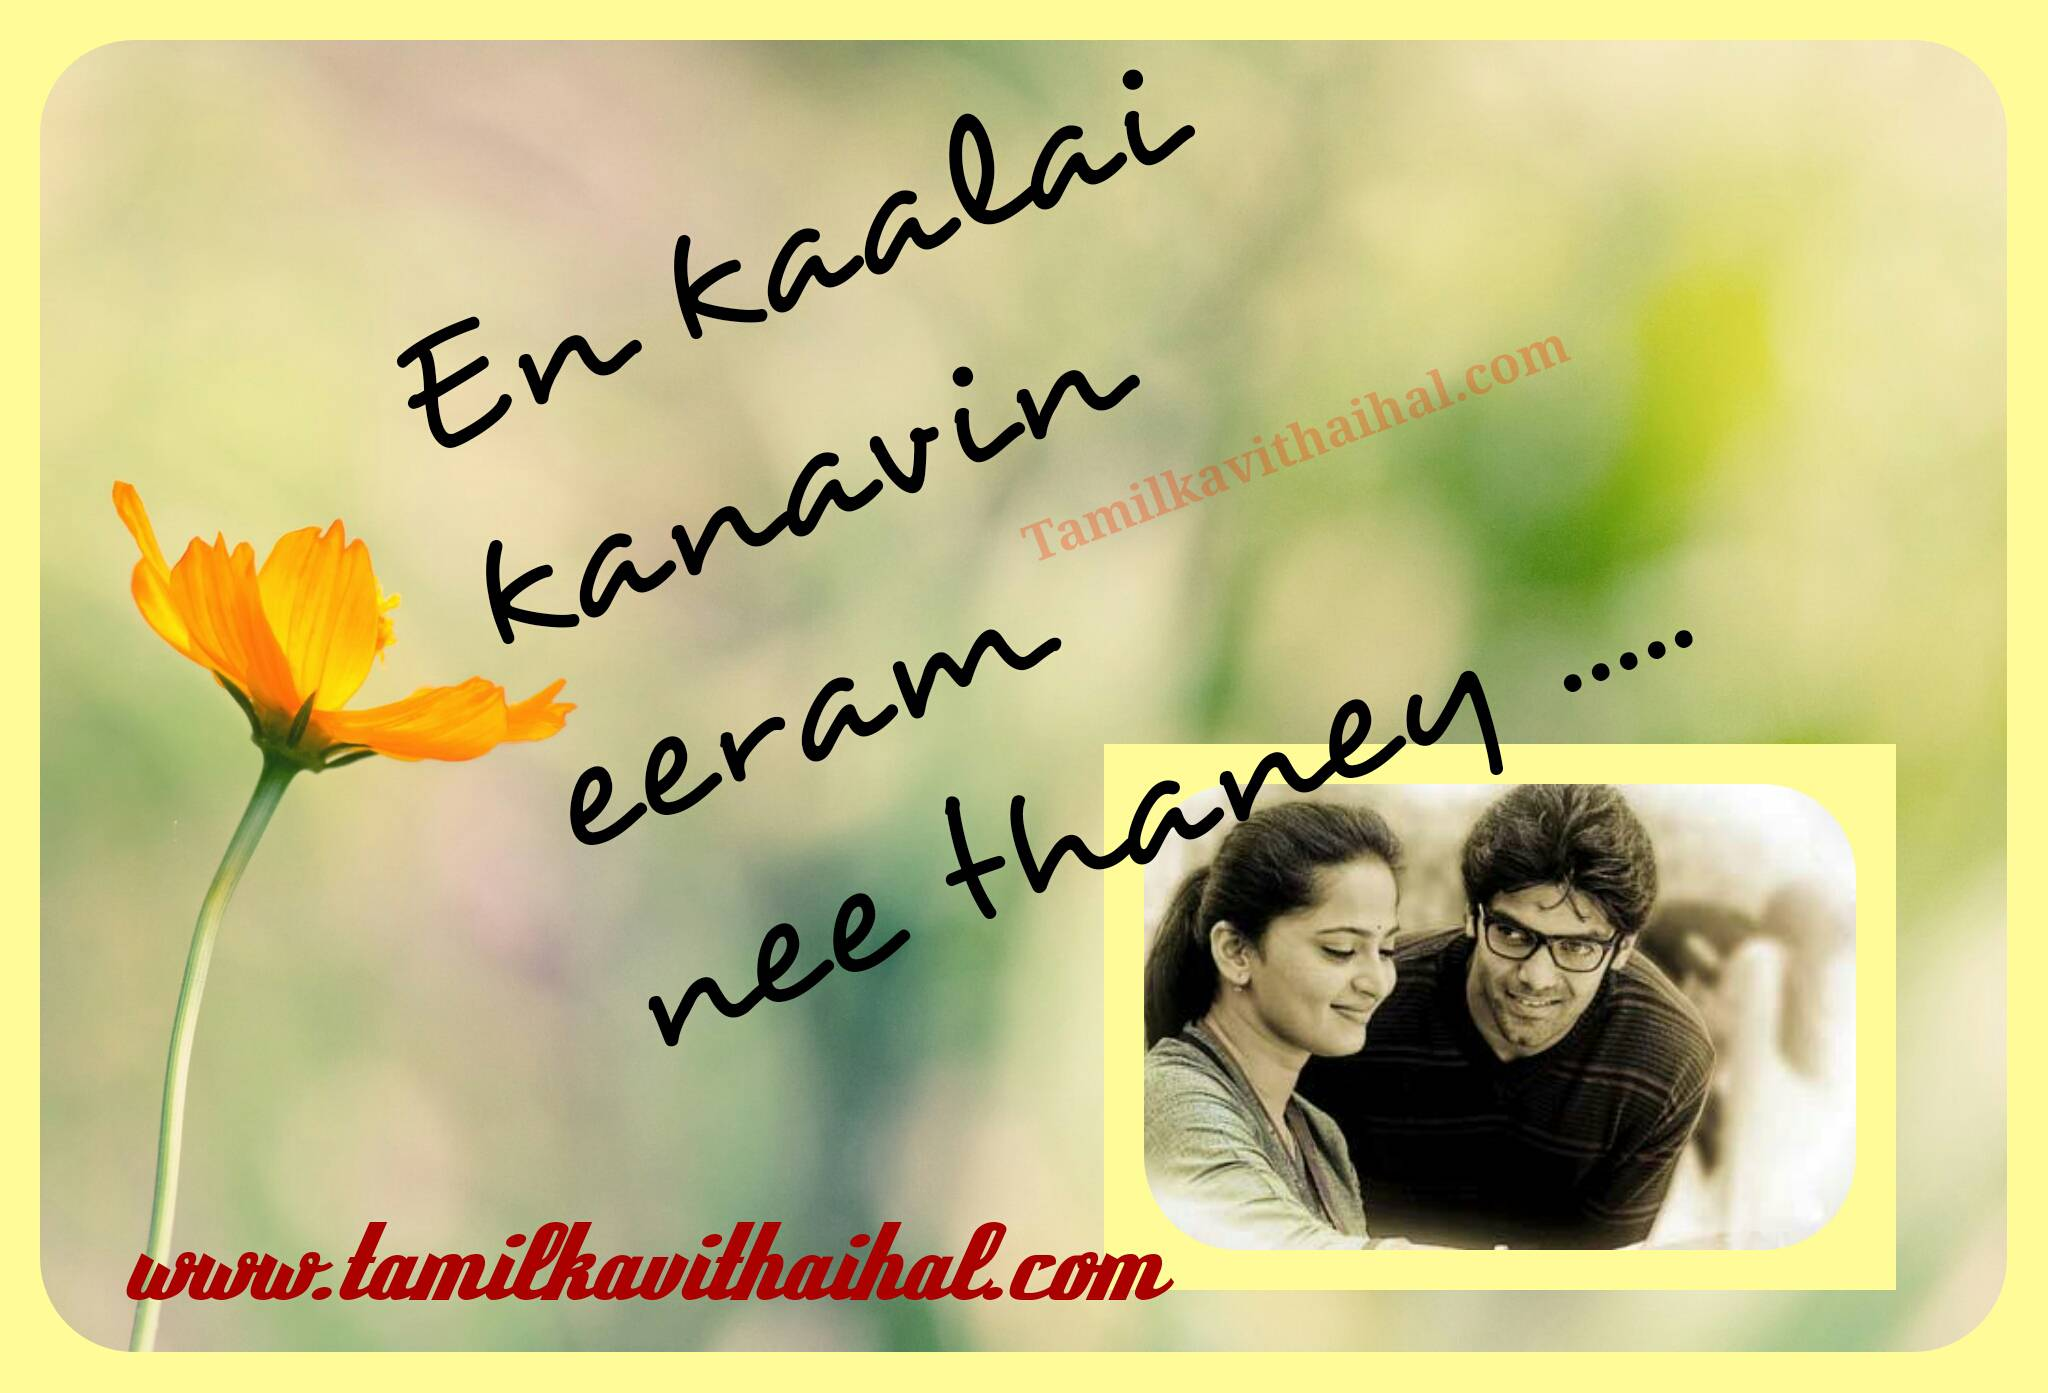 Arya emotional love sogam song quotes anushka kaalai kanavu eeram whatsapp images profile